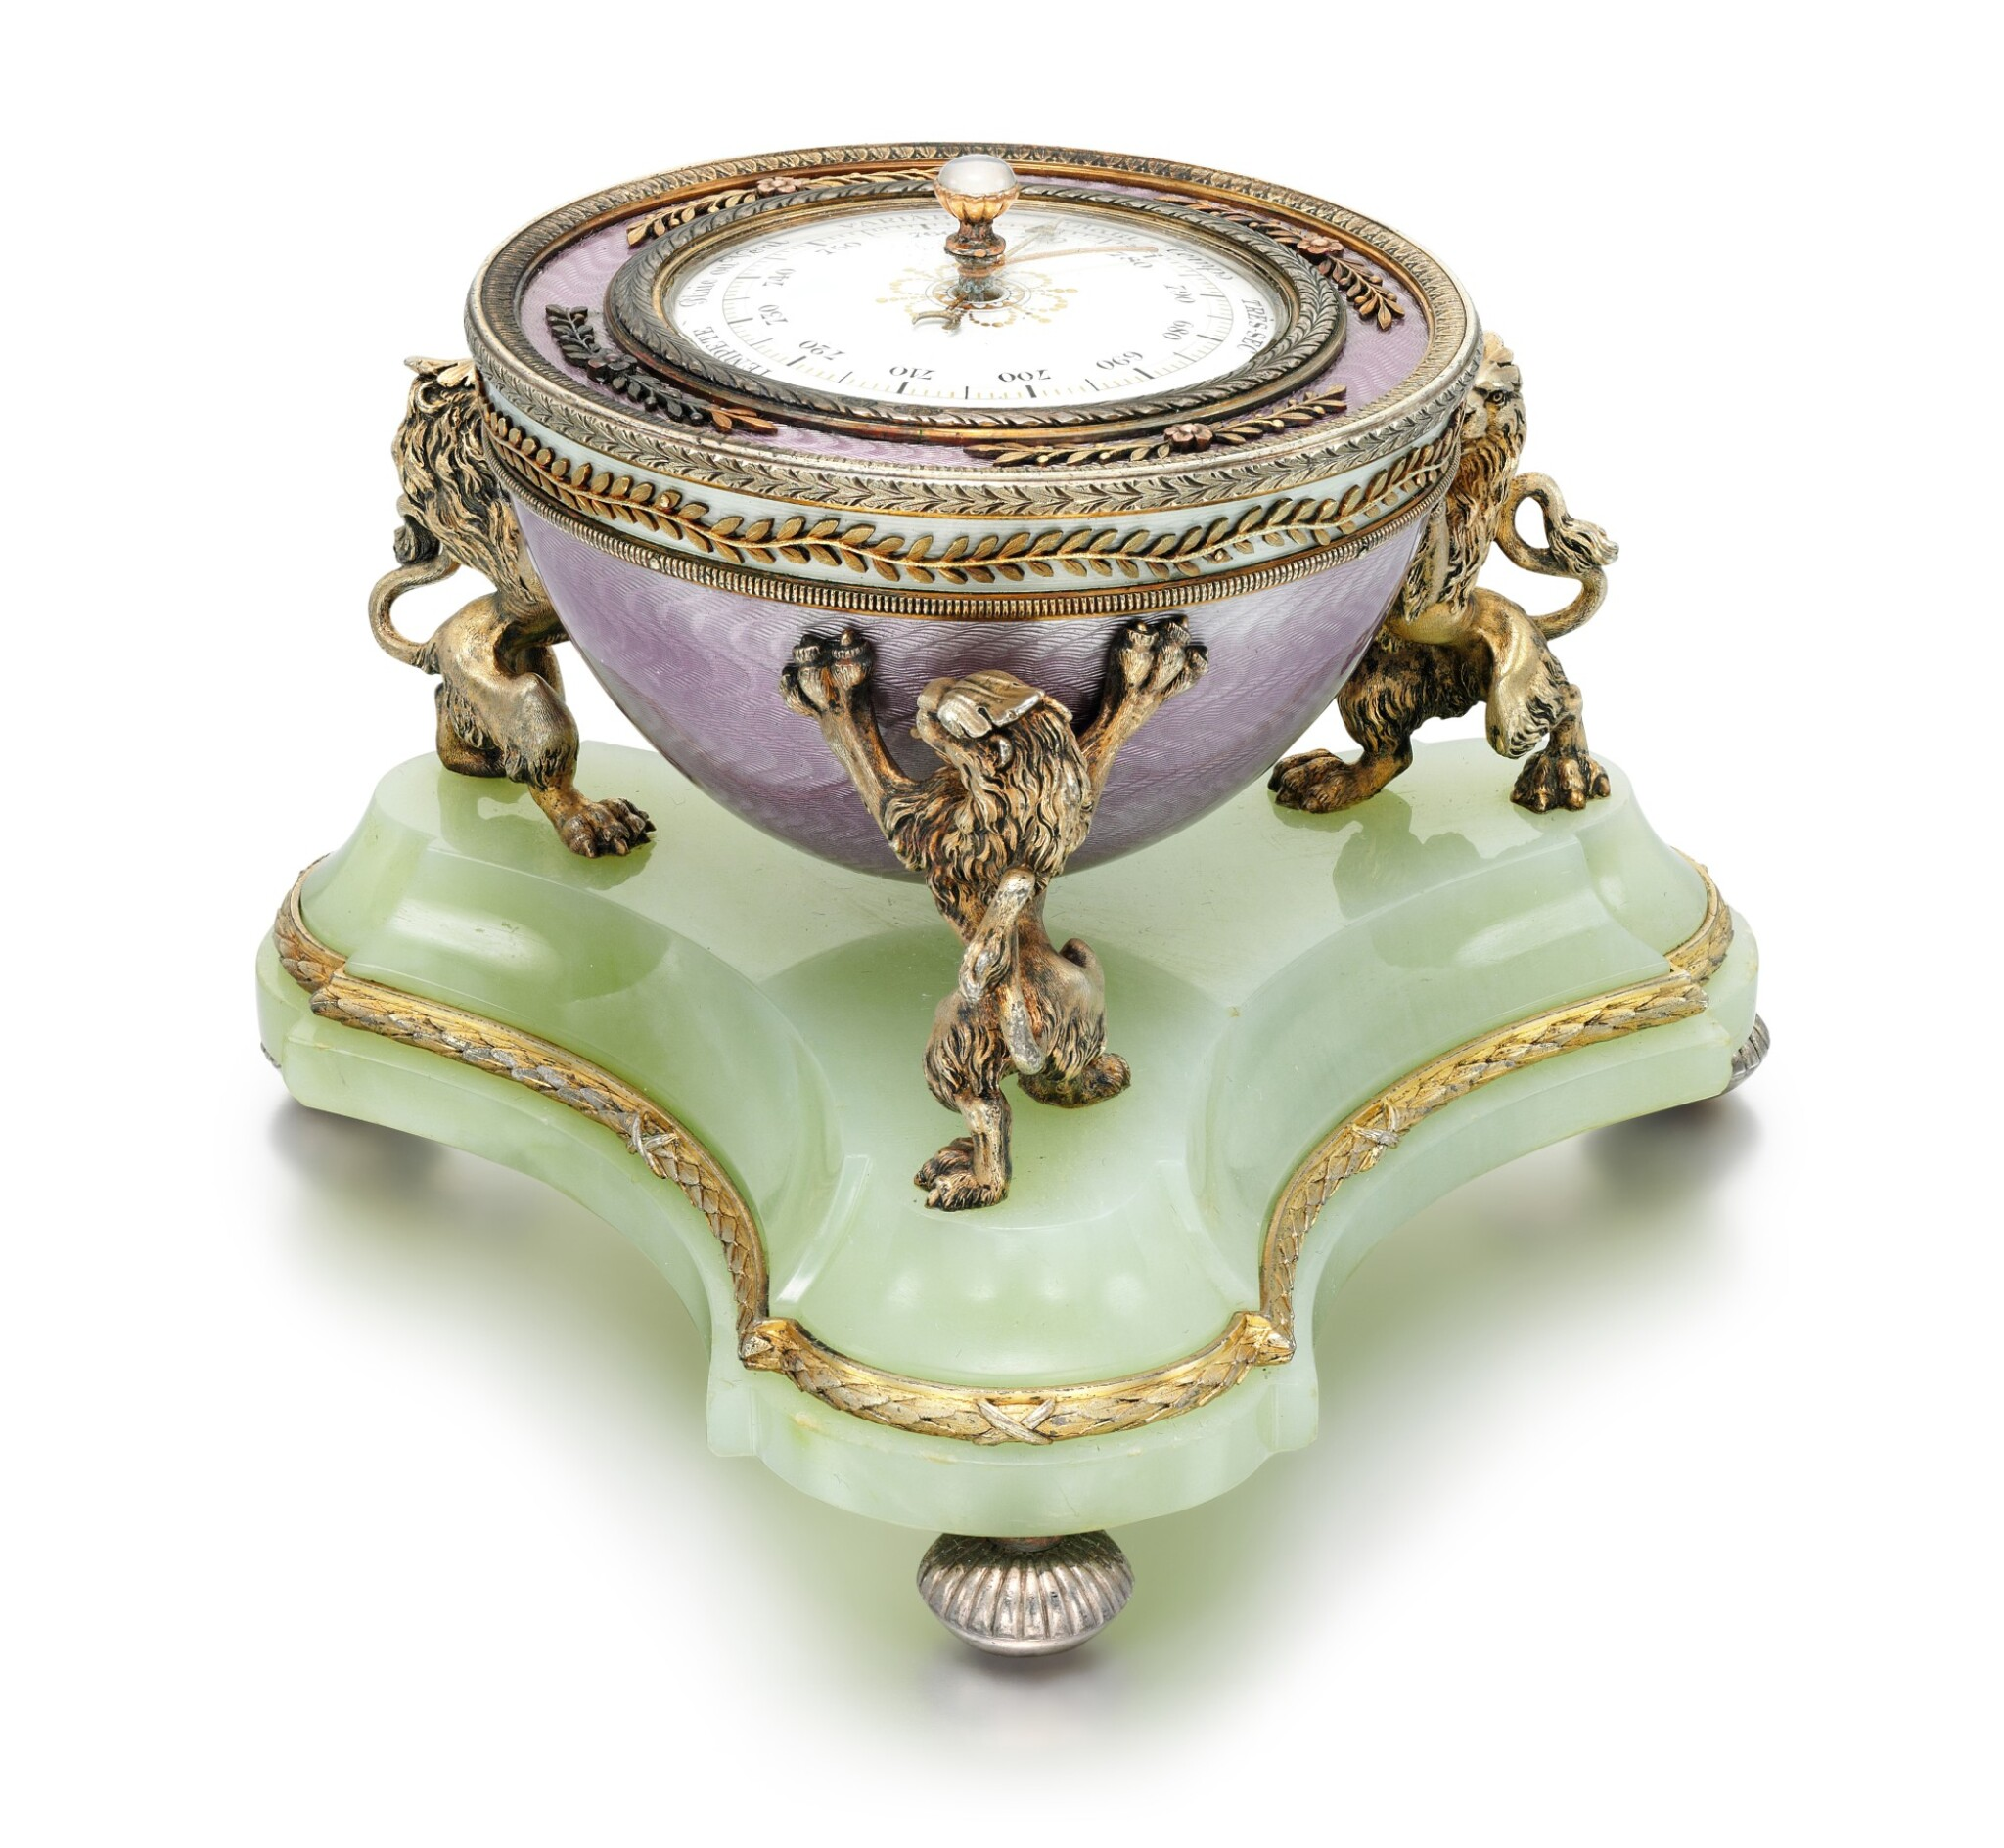 View full screen - View 1 of Lot 20. A Fabergé silver-gilt guilloché enamel and bowenite barometer, workmaster Henrik Wigström, St Petersburg, 1903.